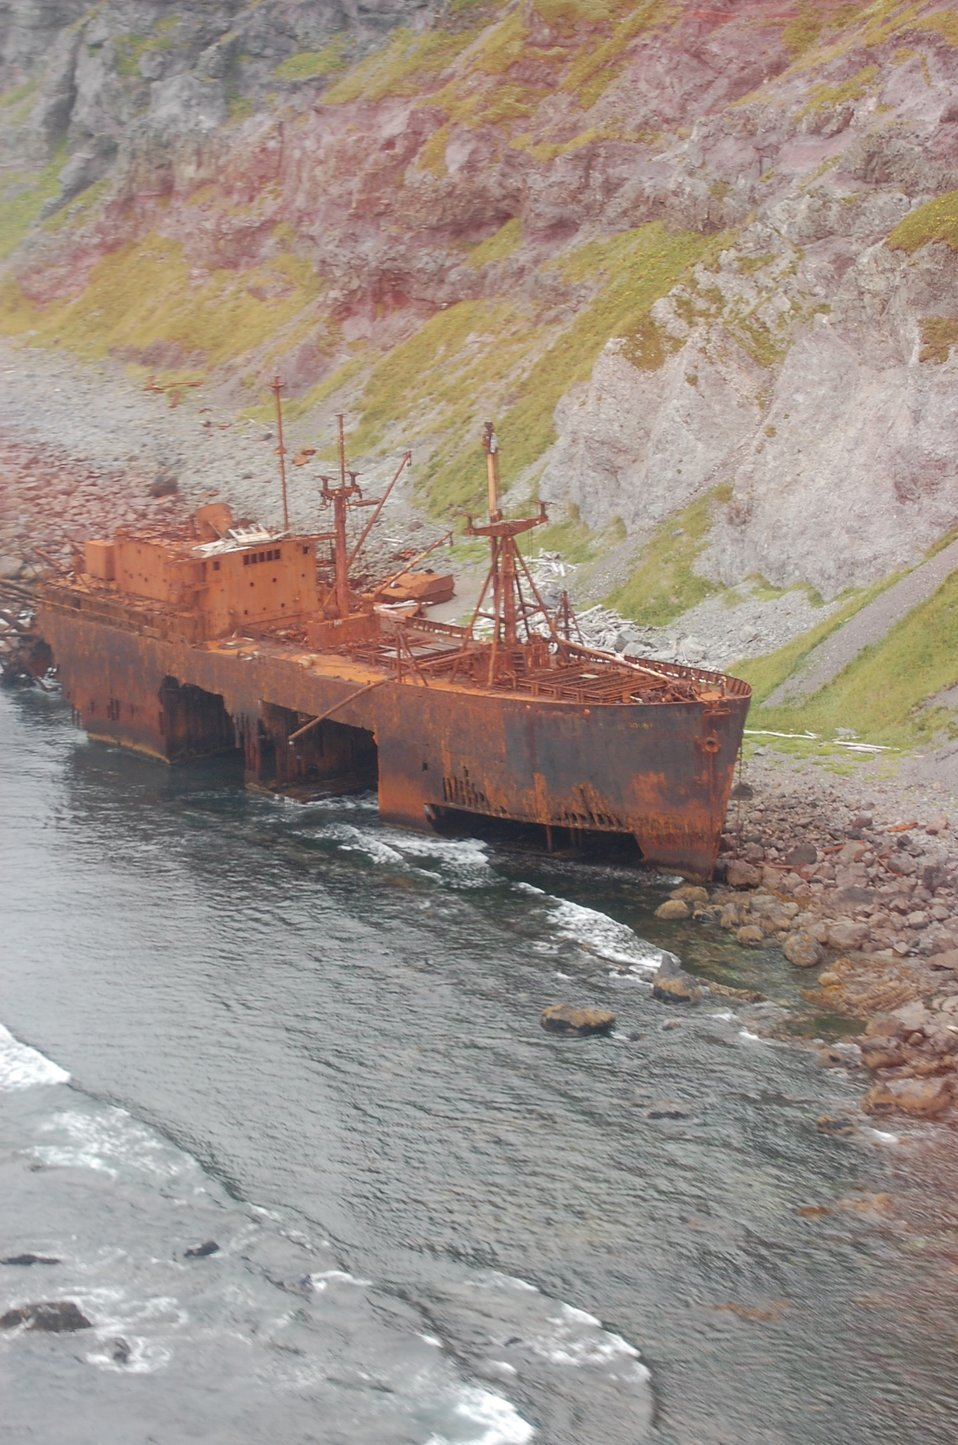 Shipwrecked Oduna